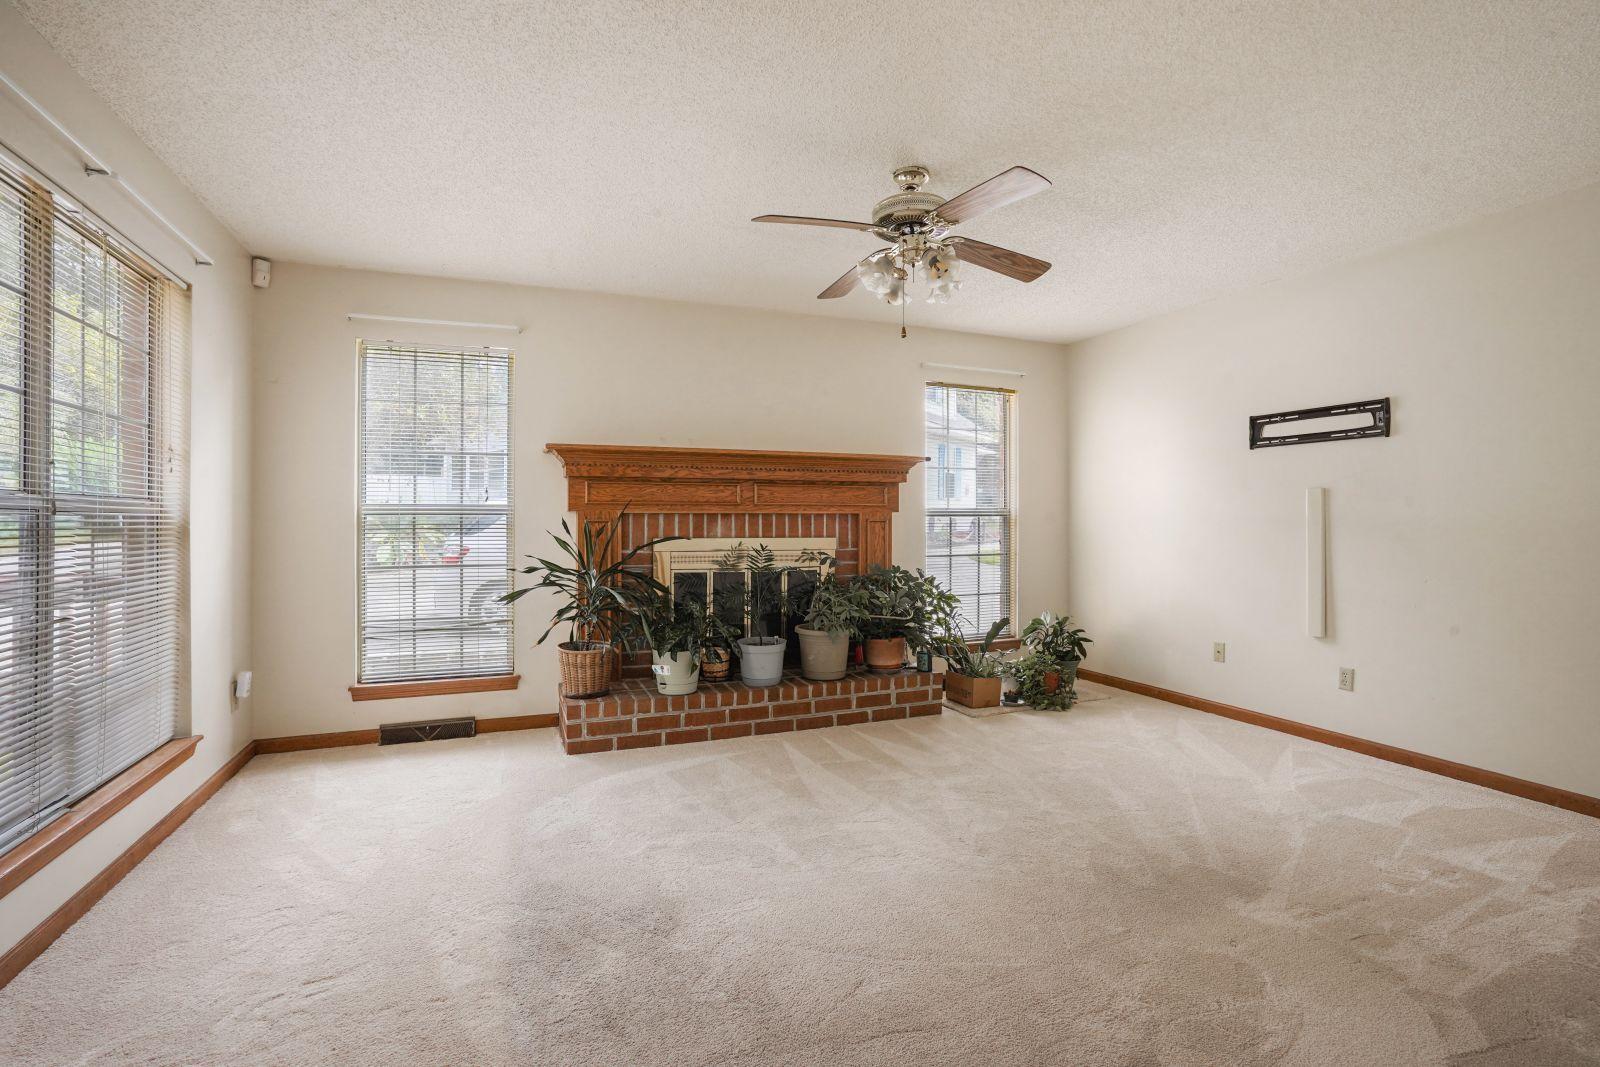 Crowfield Plantation Homes For Sale - 161 Belleplaine, Goose Creek, SC - 11